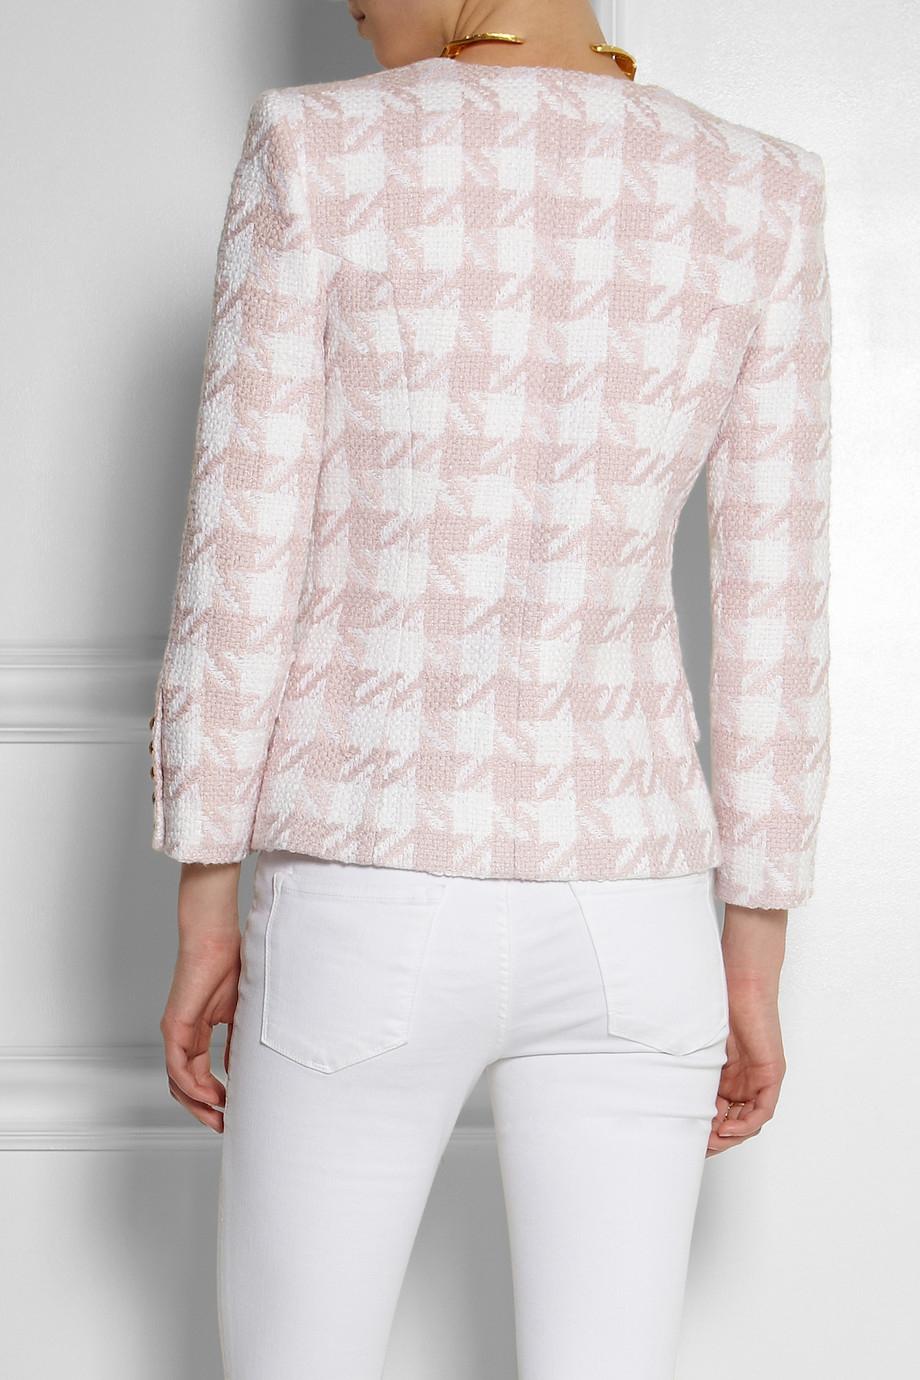 Balmain Houndstooth Cottonblend Tweed Jacket in Pink | Lyst